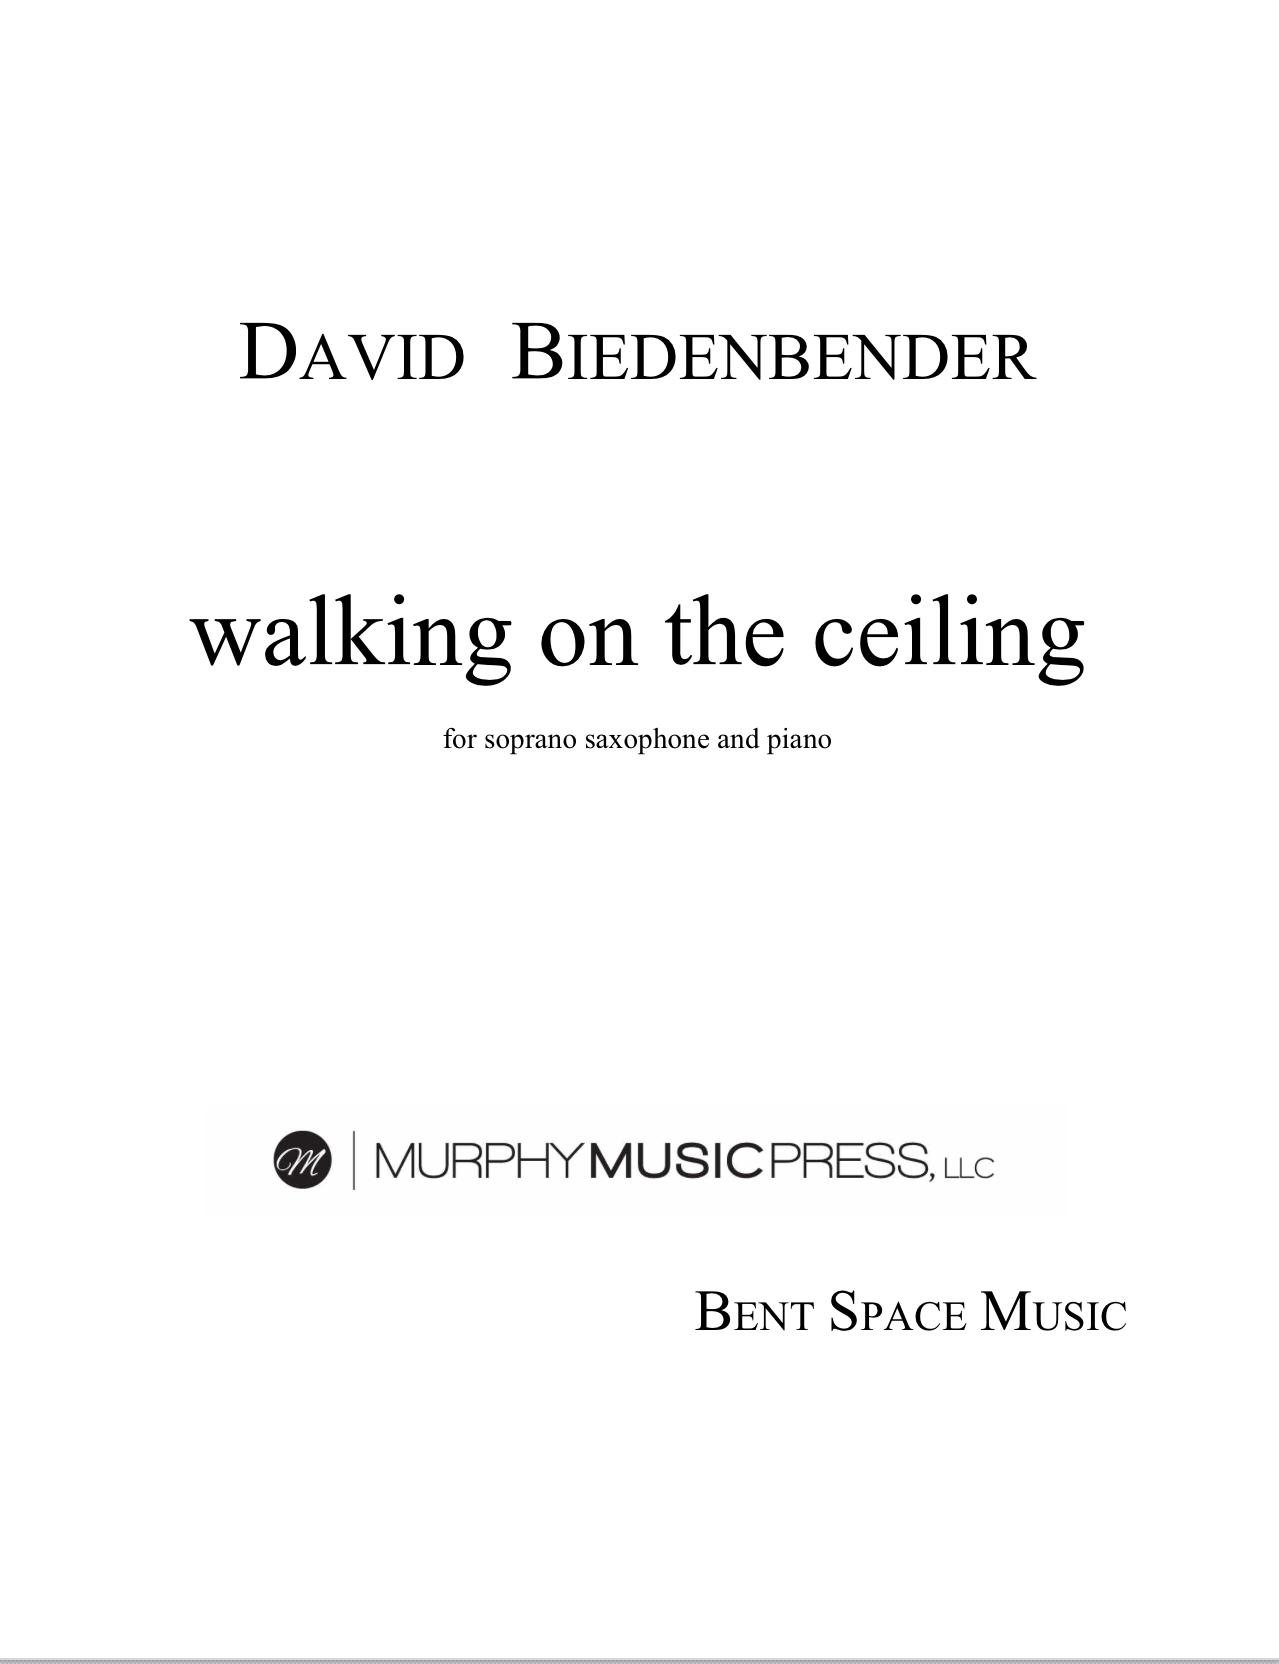 Walking On The Ceiling by David Biedenbender